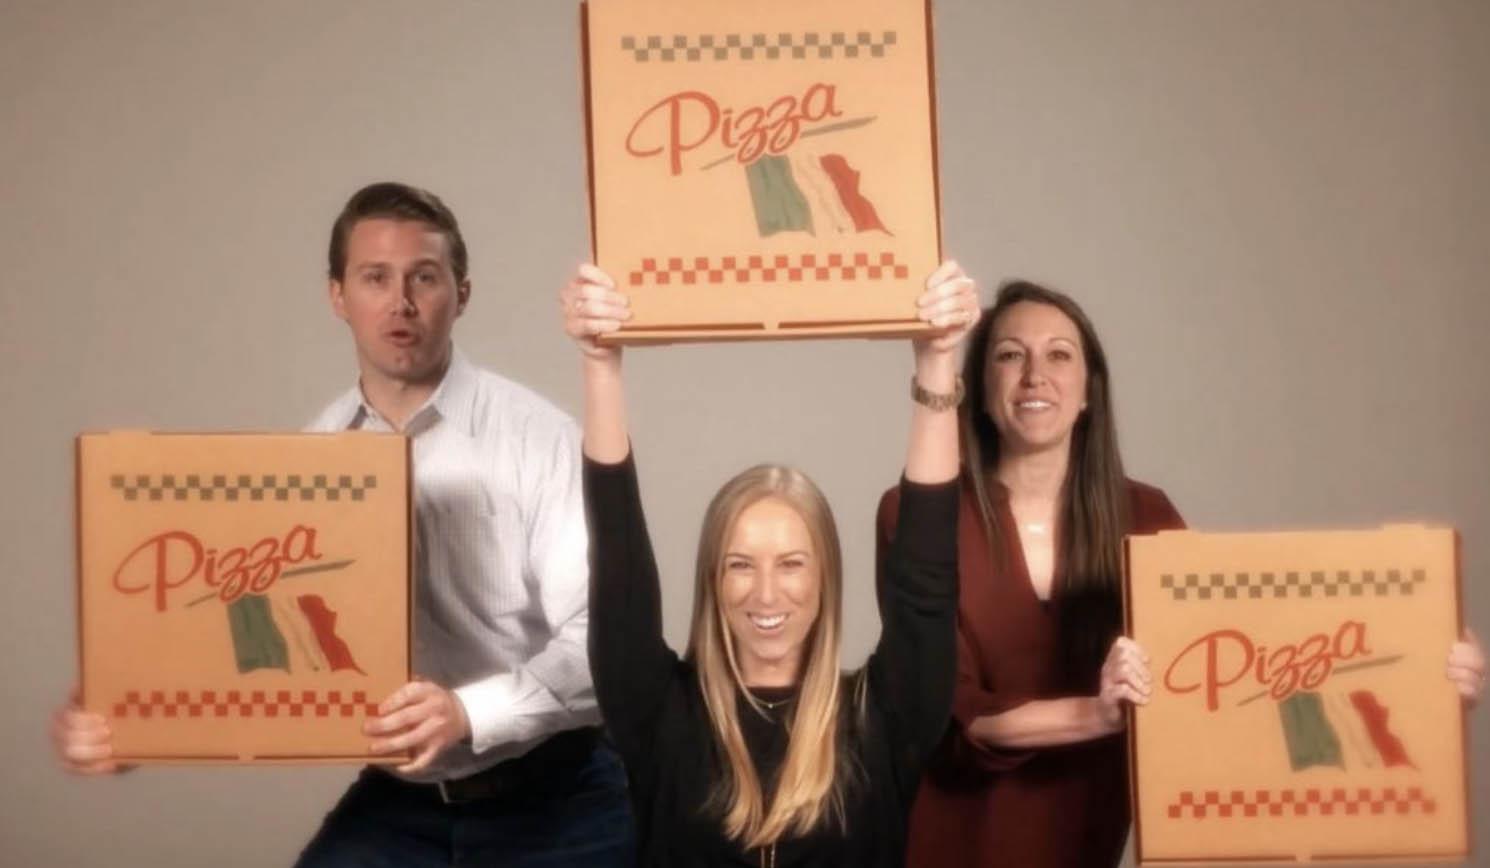 Pizza boxes make good pom poms too!